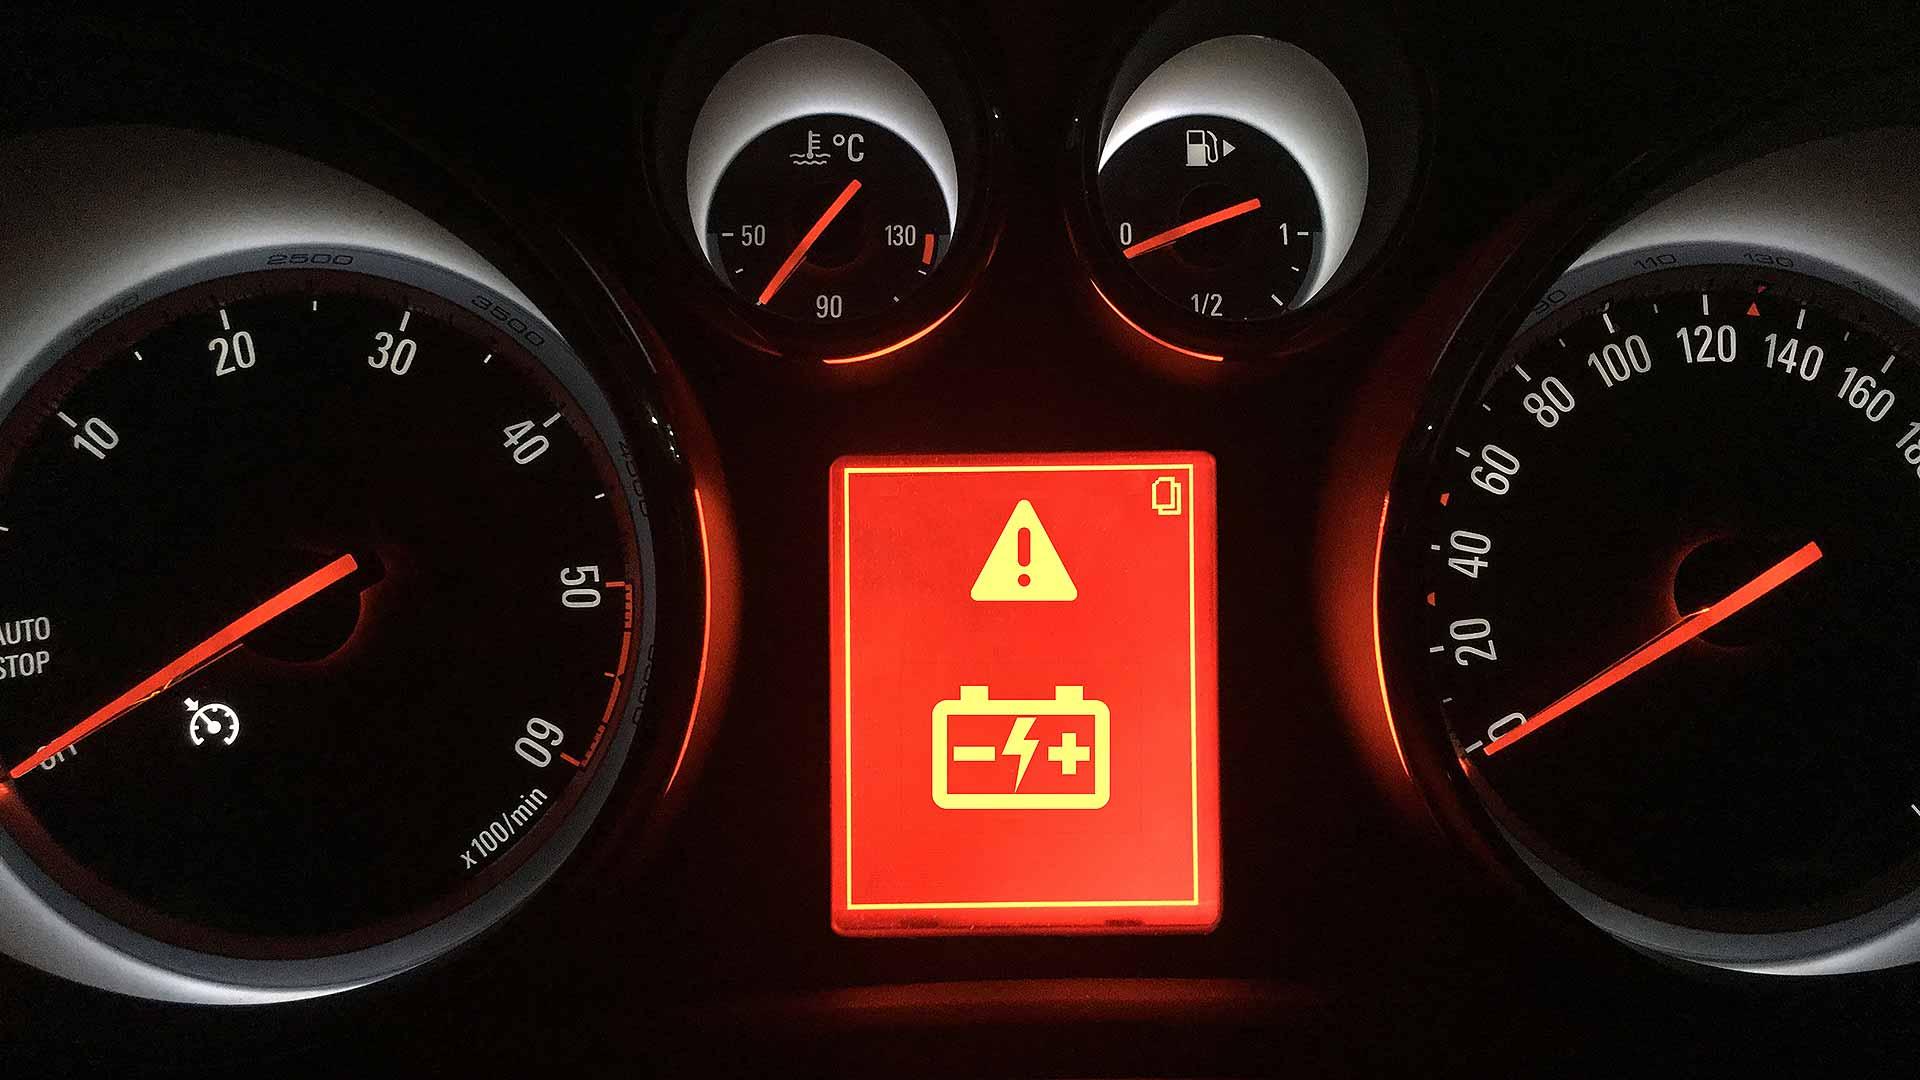 Flat car battery warning symbol